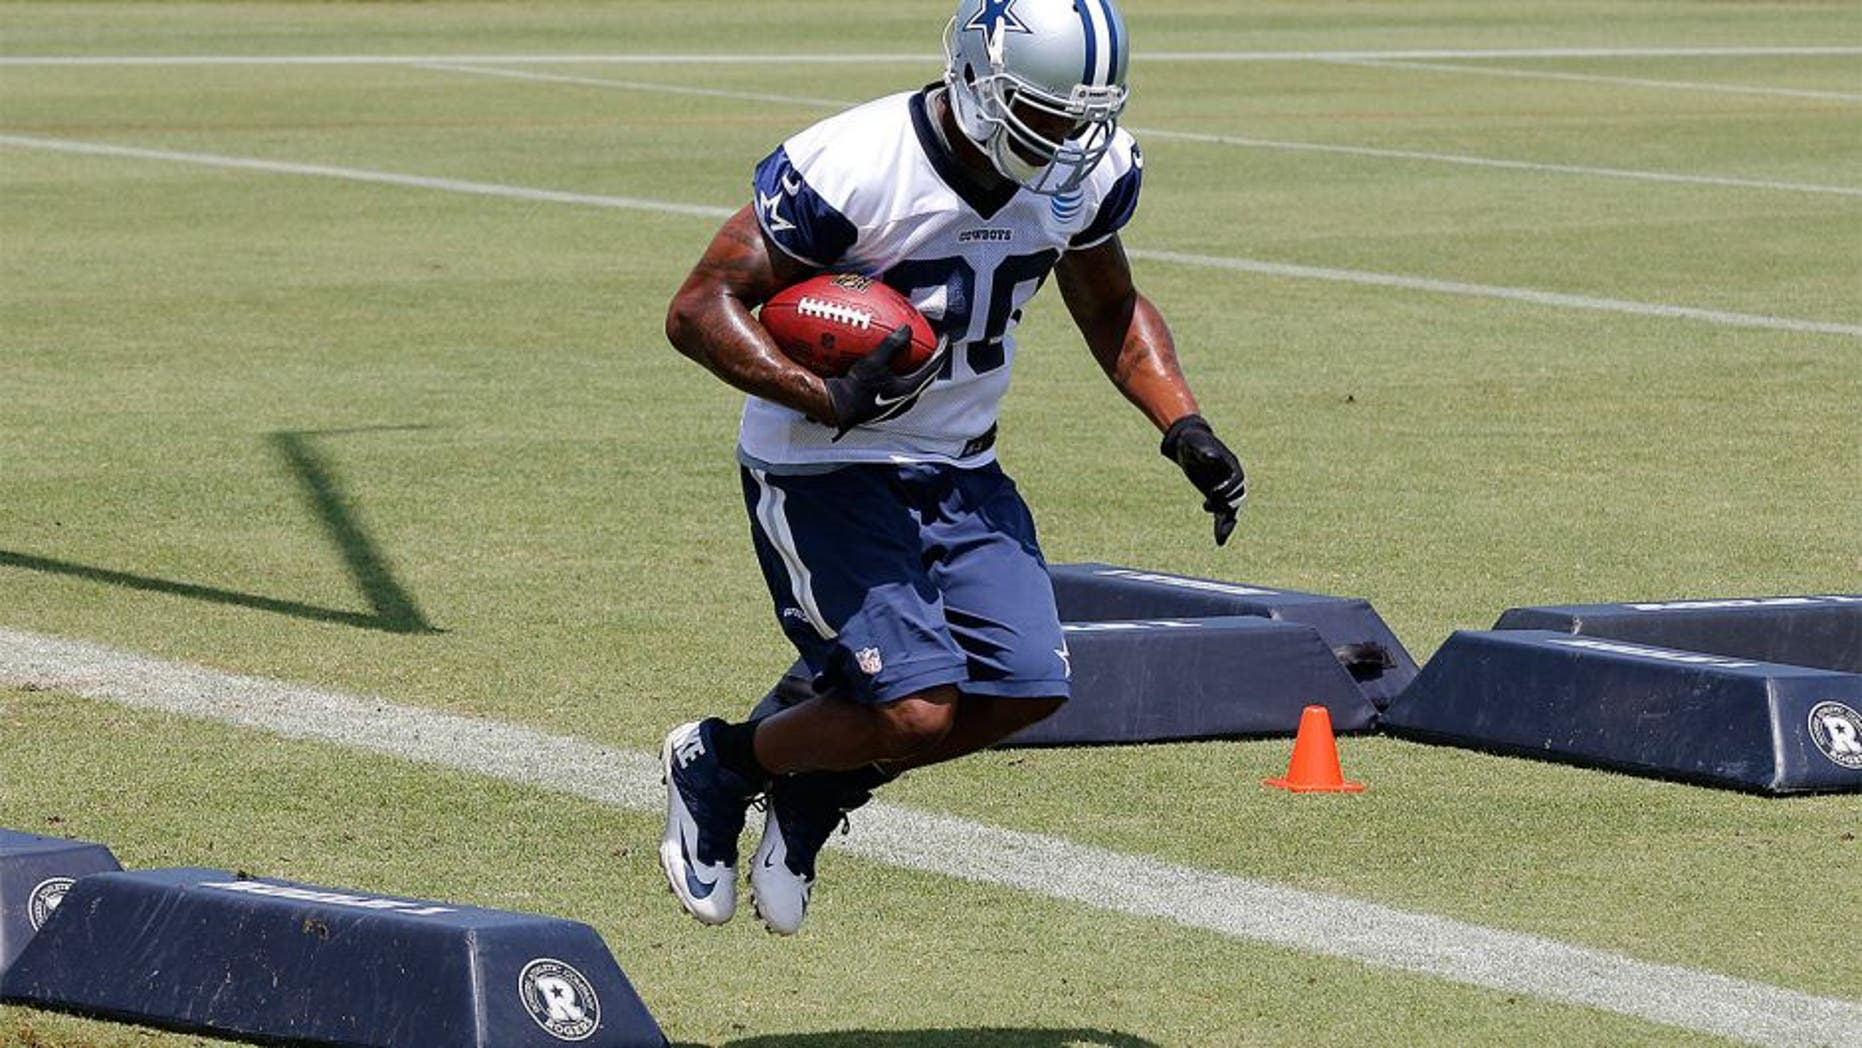 May 27, 2015; Dallas, TX, USA; Dallas Cowboys running back Darren McFadden (20) runs drills during OTAs at Dallas Cowboys Headquarters. Mandatory Credit: Matthew Emmons-USA TODAY Sports